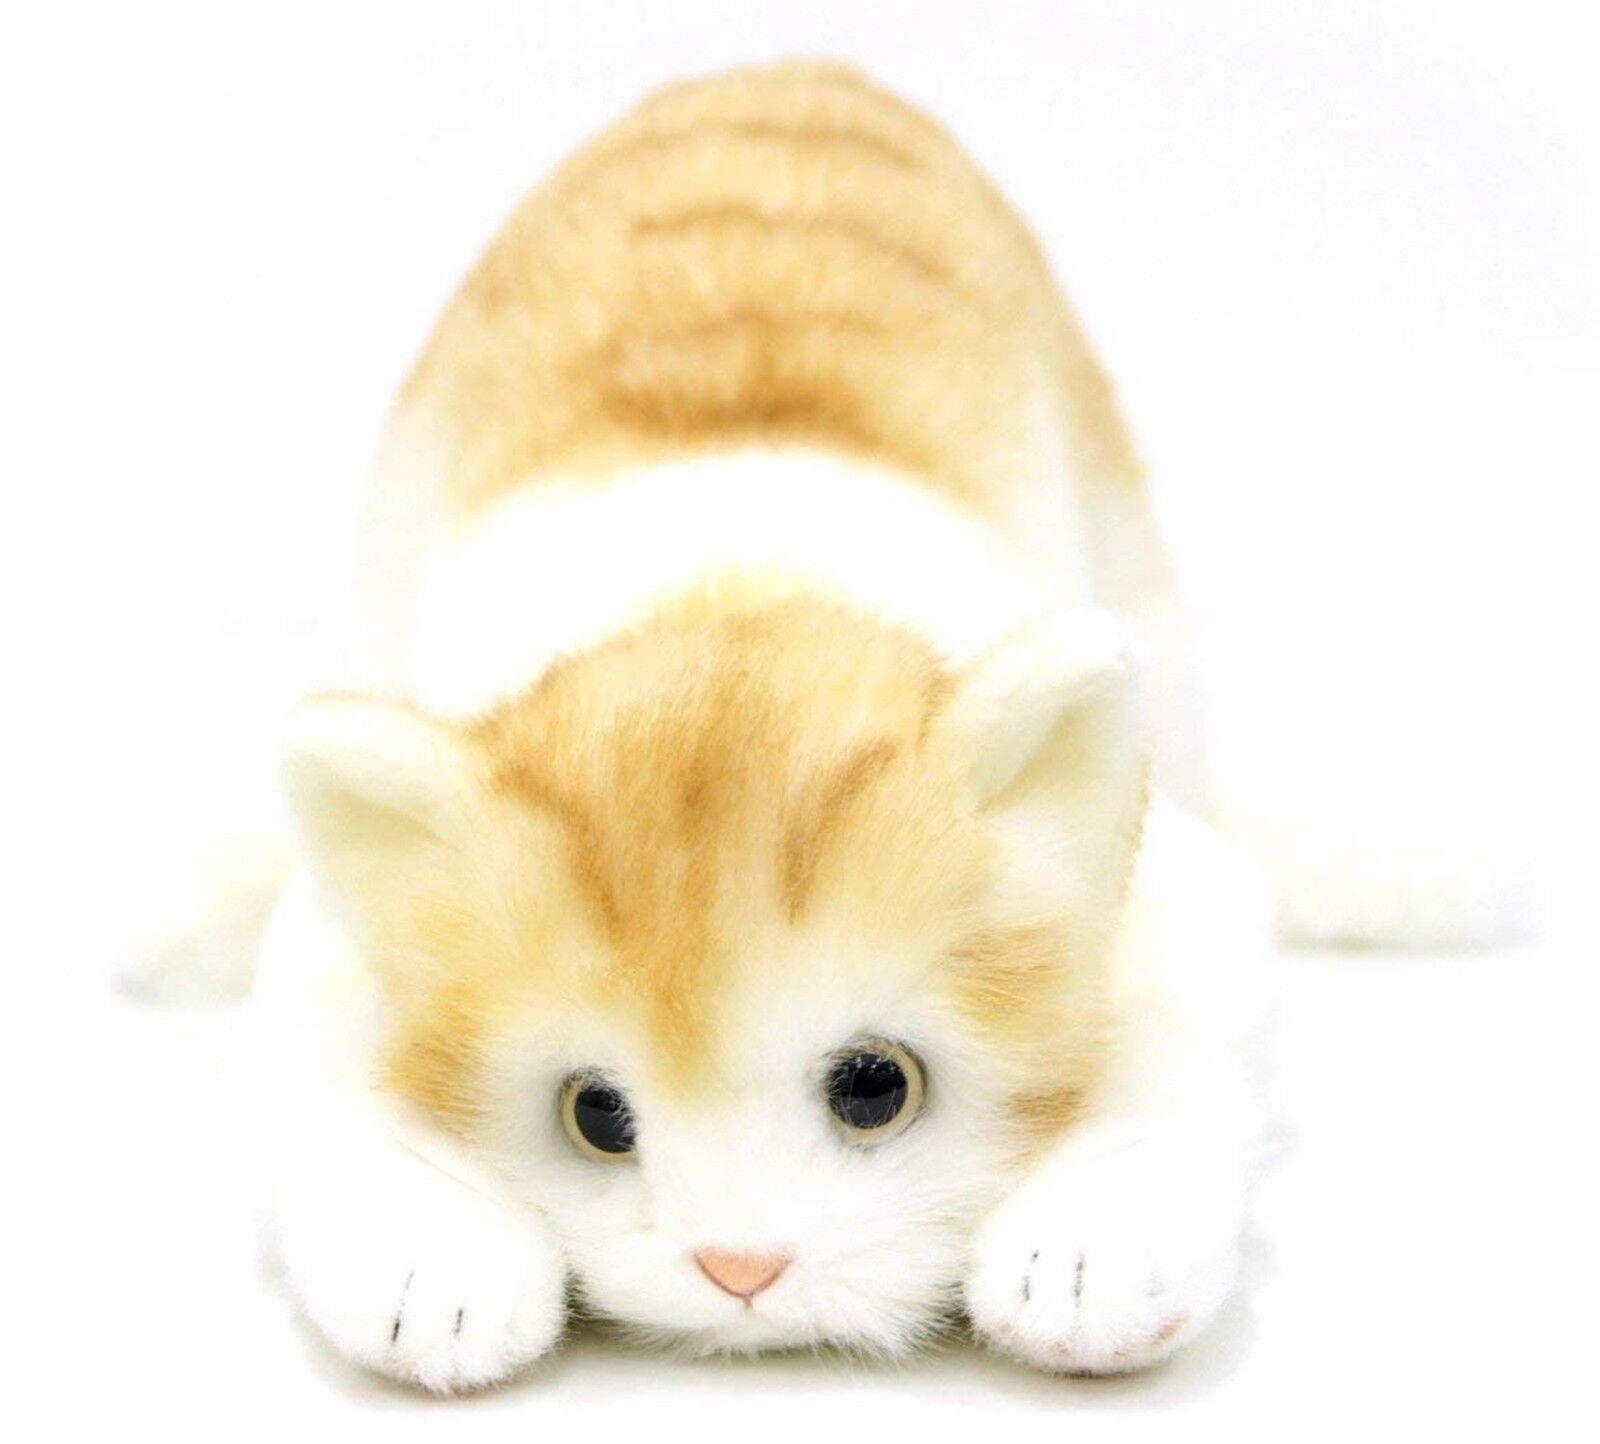 DOUSIN Made in Japan Realistic cat stuffed toy Plush TorarBraun L eyesight 58cm